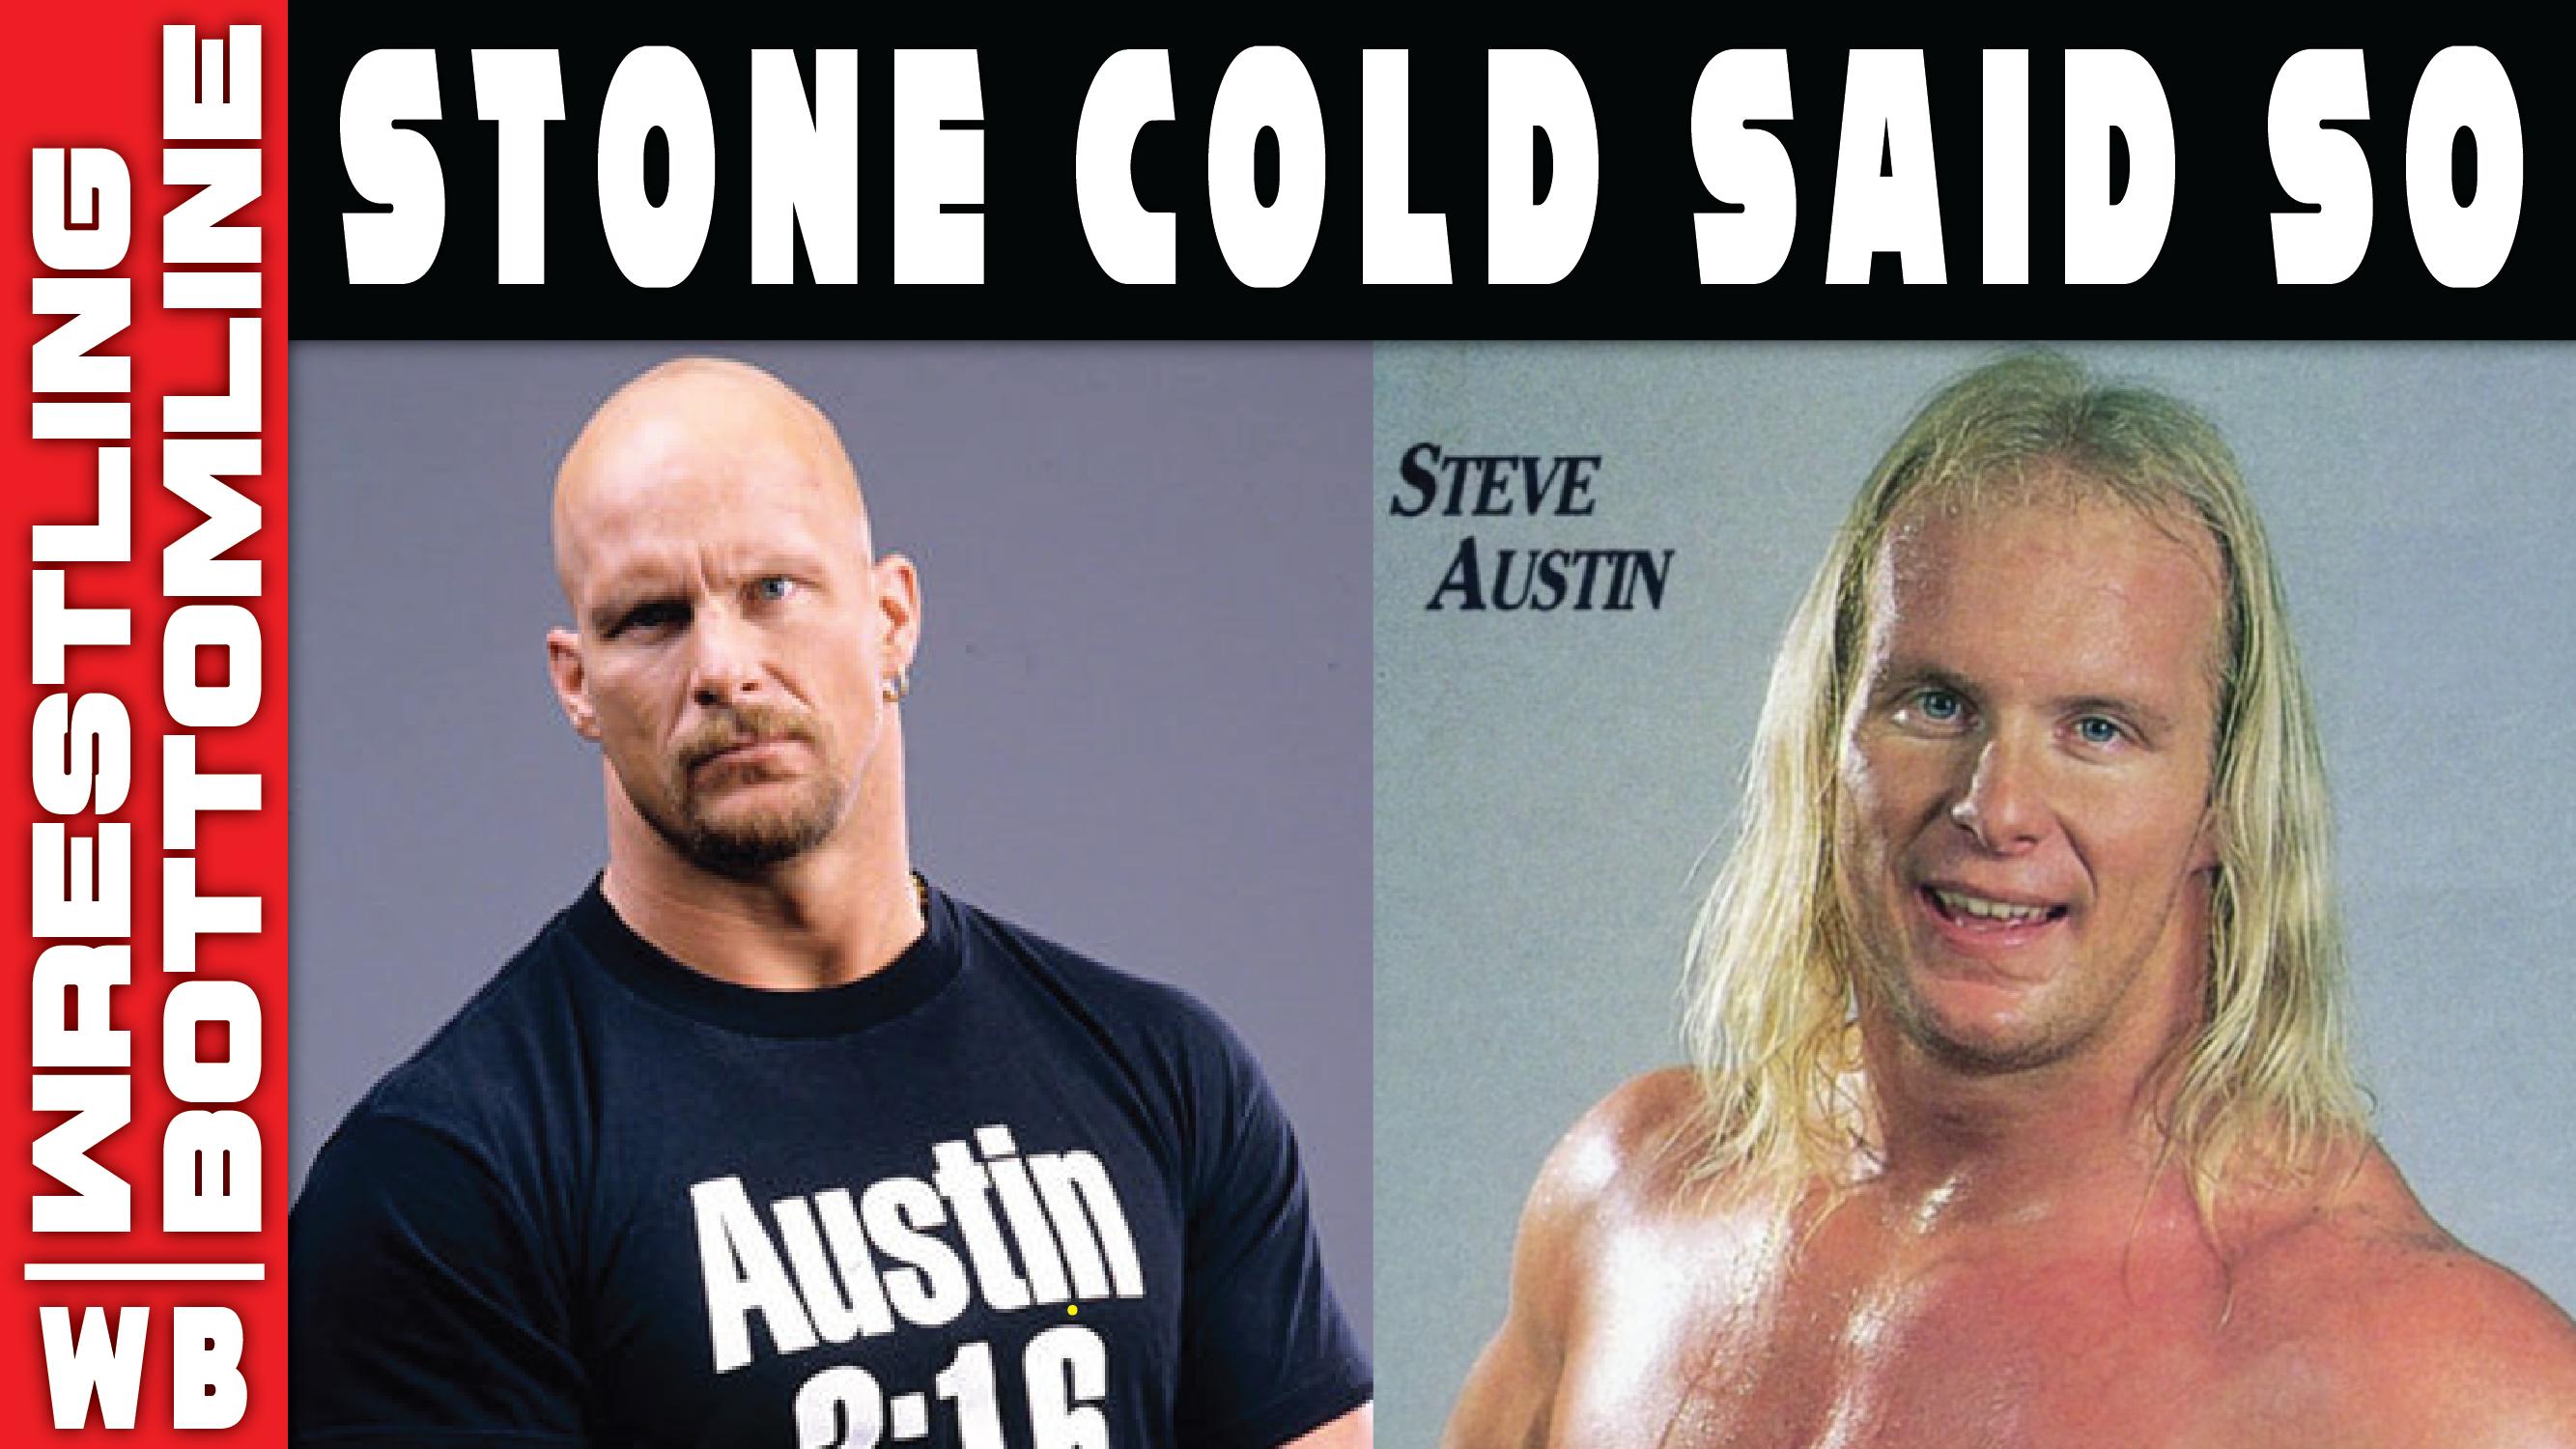 Stone Cold Said So Stone Cold Steve Austin On Adjusting To Going Bald Balding Going Bald Bald Hair